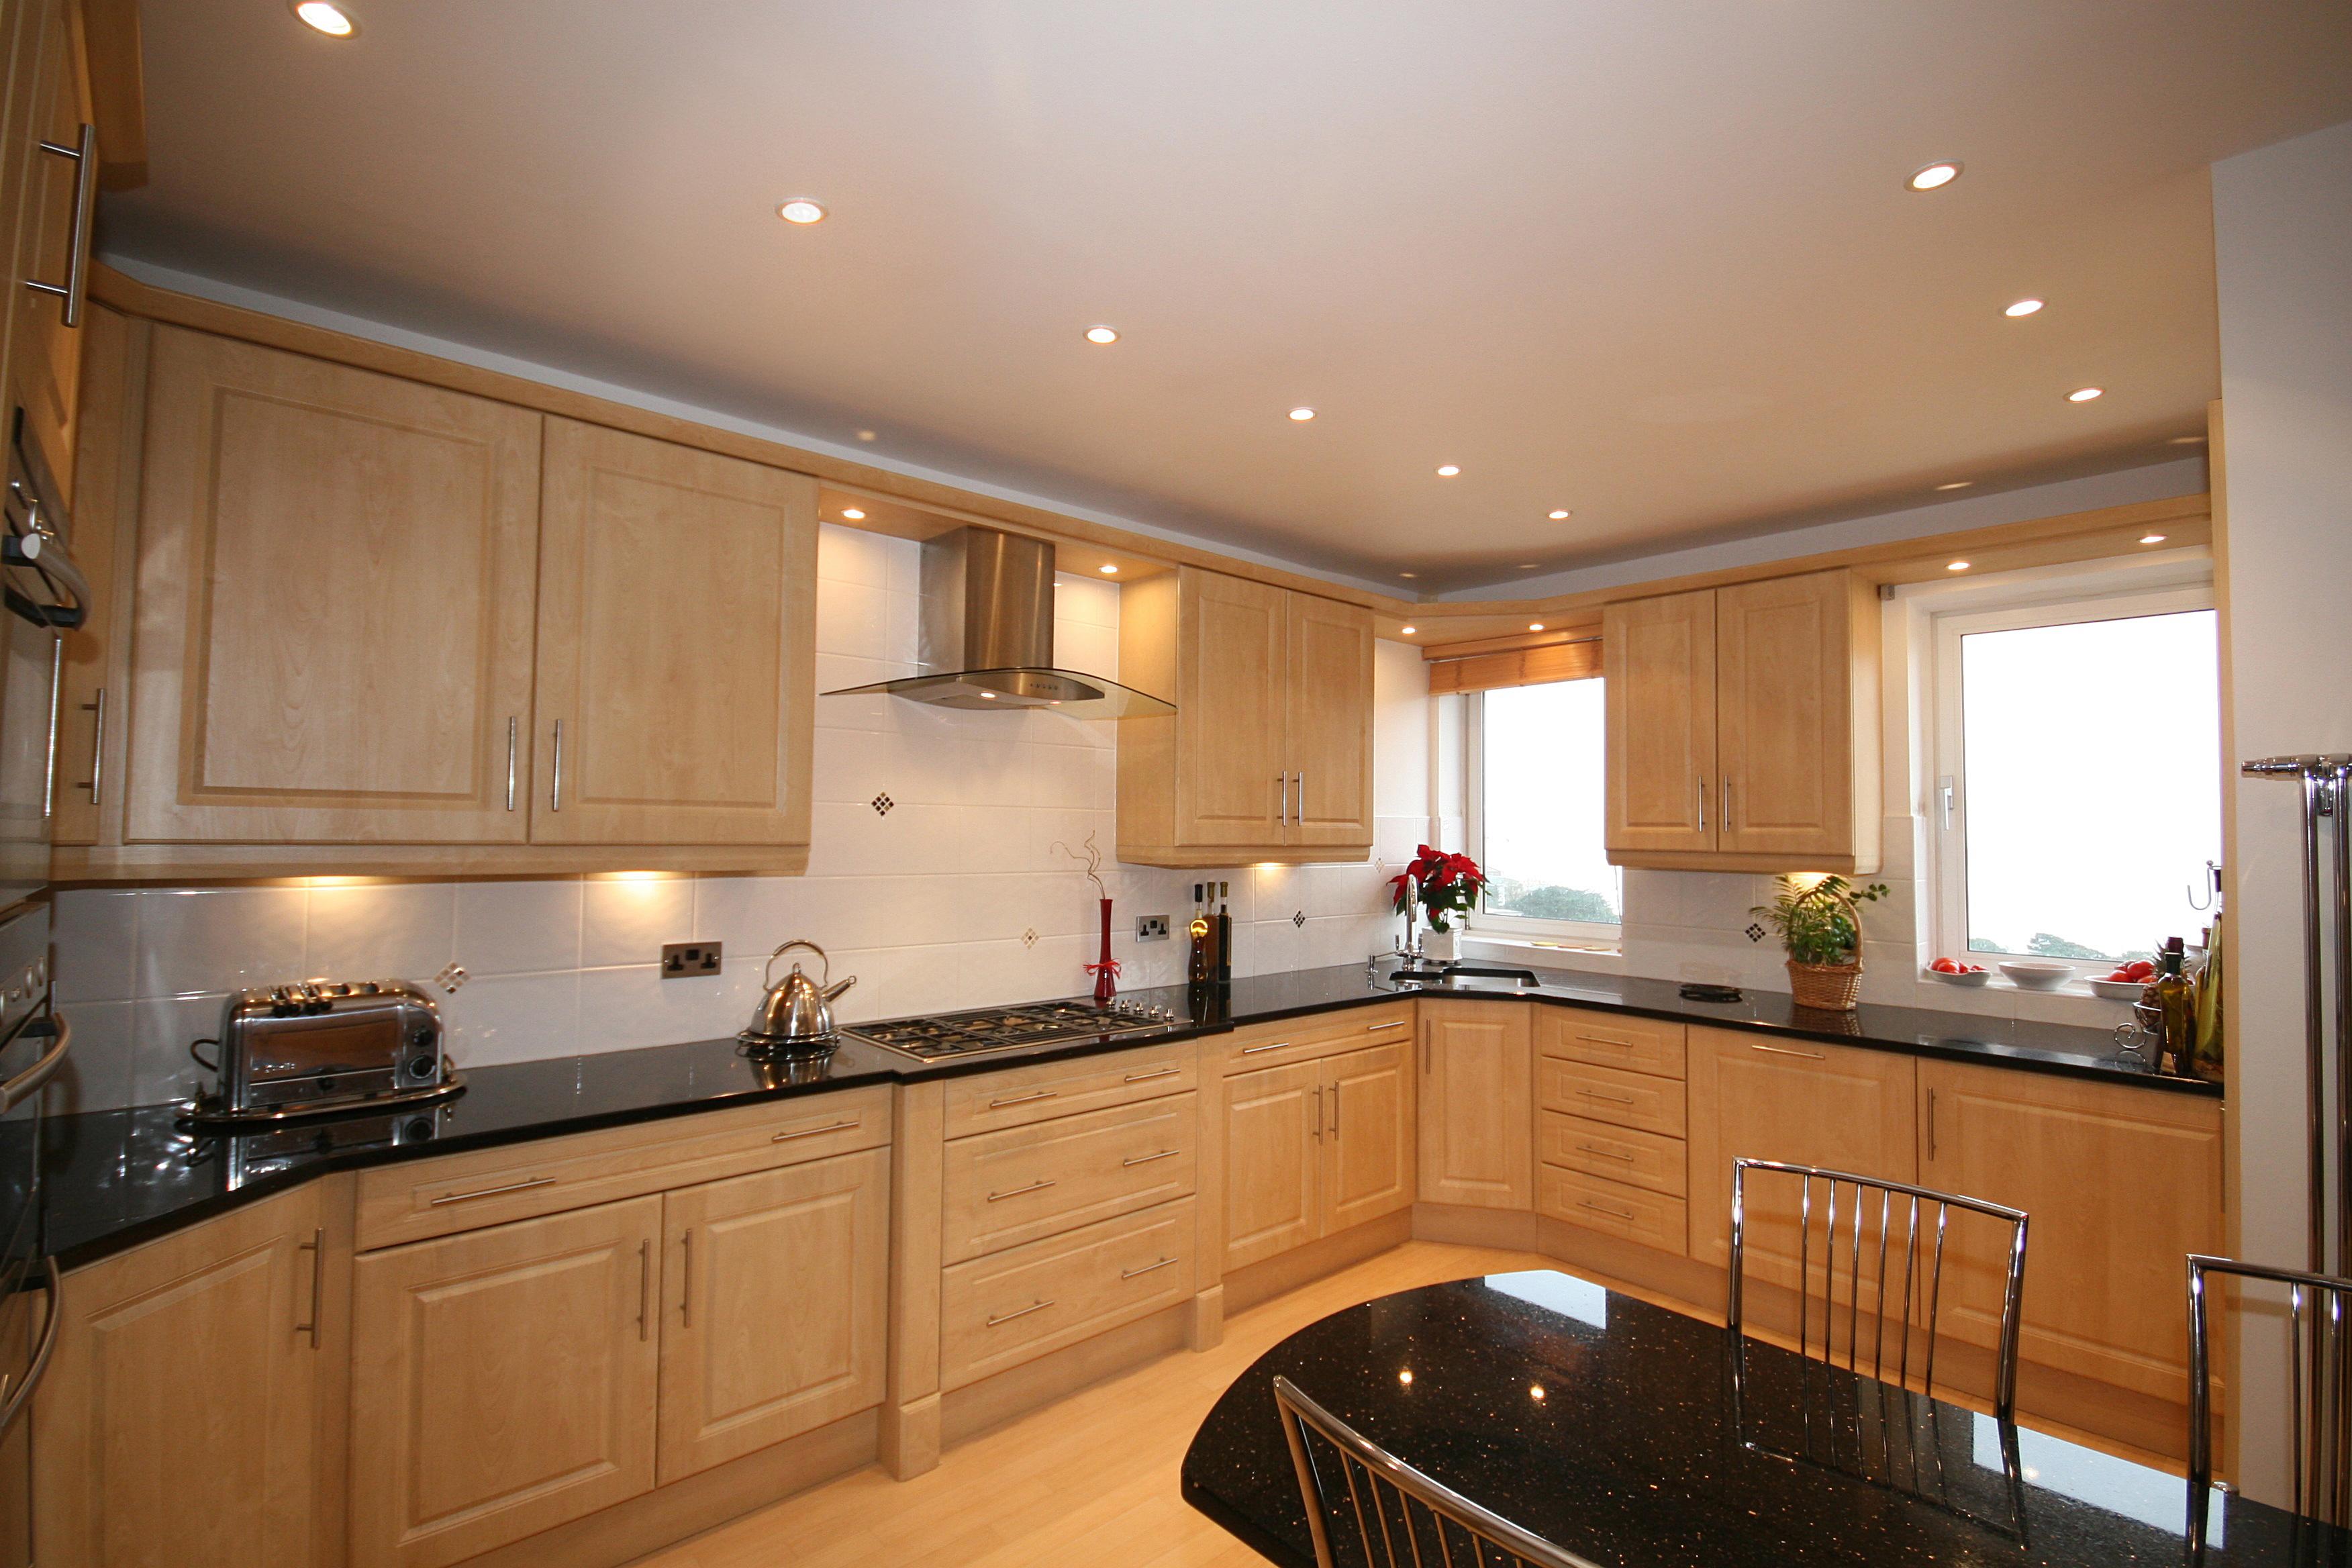 Bespoke Kitchens Newcastle